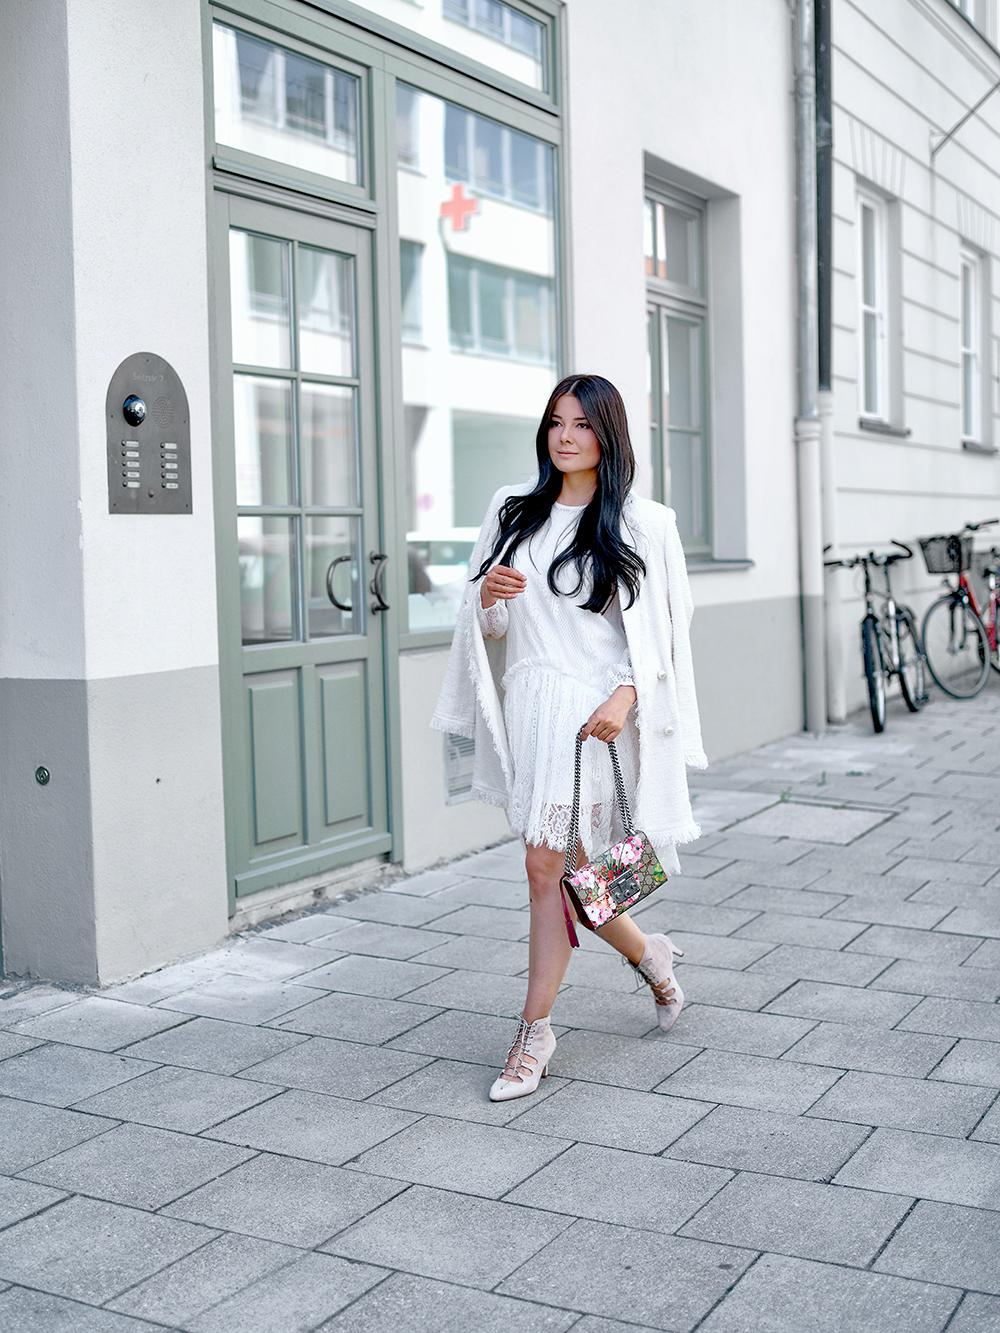 fashionambit-fashionblog-muenchen-modeblog-deutschland-blogger-modeblogger-fashionblogger-bloggerdeutschland-lifestyleblog-munich-style-blog-weiß-kleid